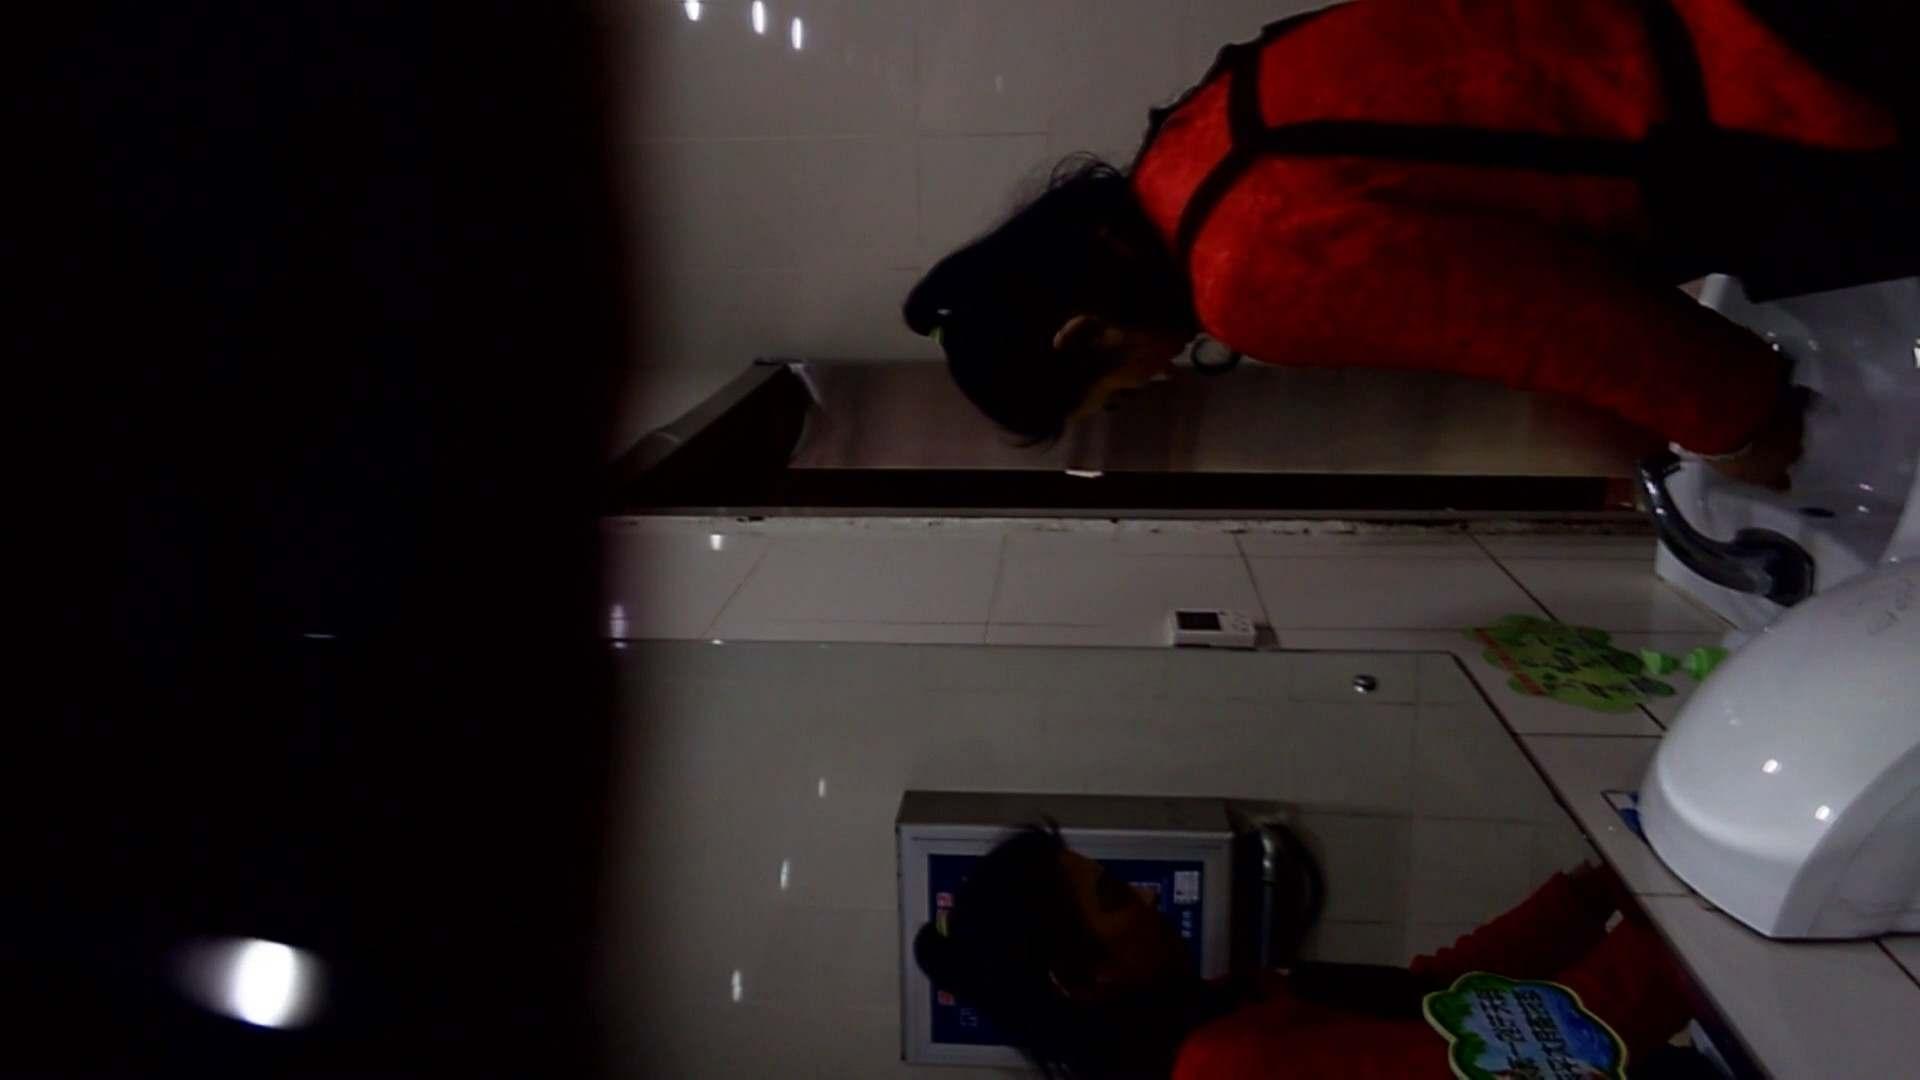 芸術大学ガチ潜入盗撮 JD盗撮 美女の洗面所の秘密 Vol.105 盛合せ オメコ無修正動画無料 83枚 64